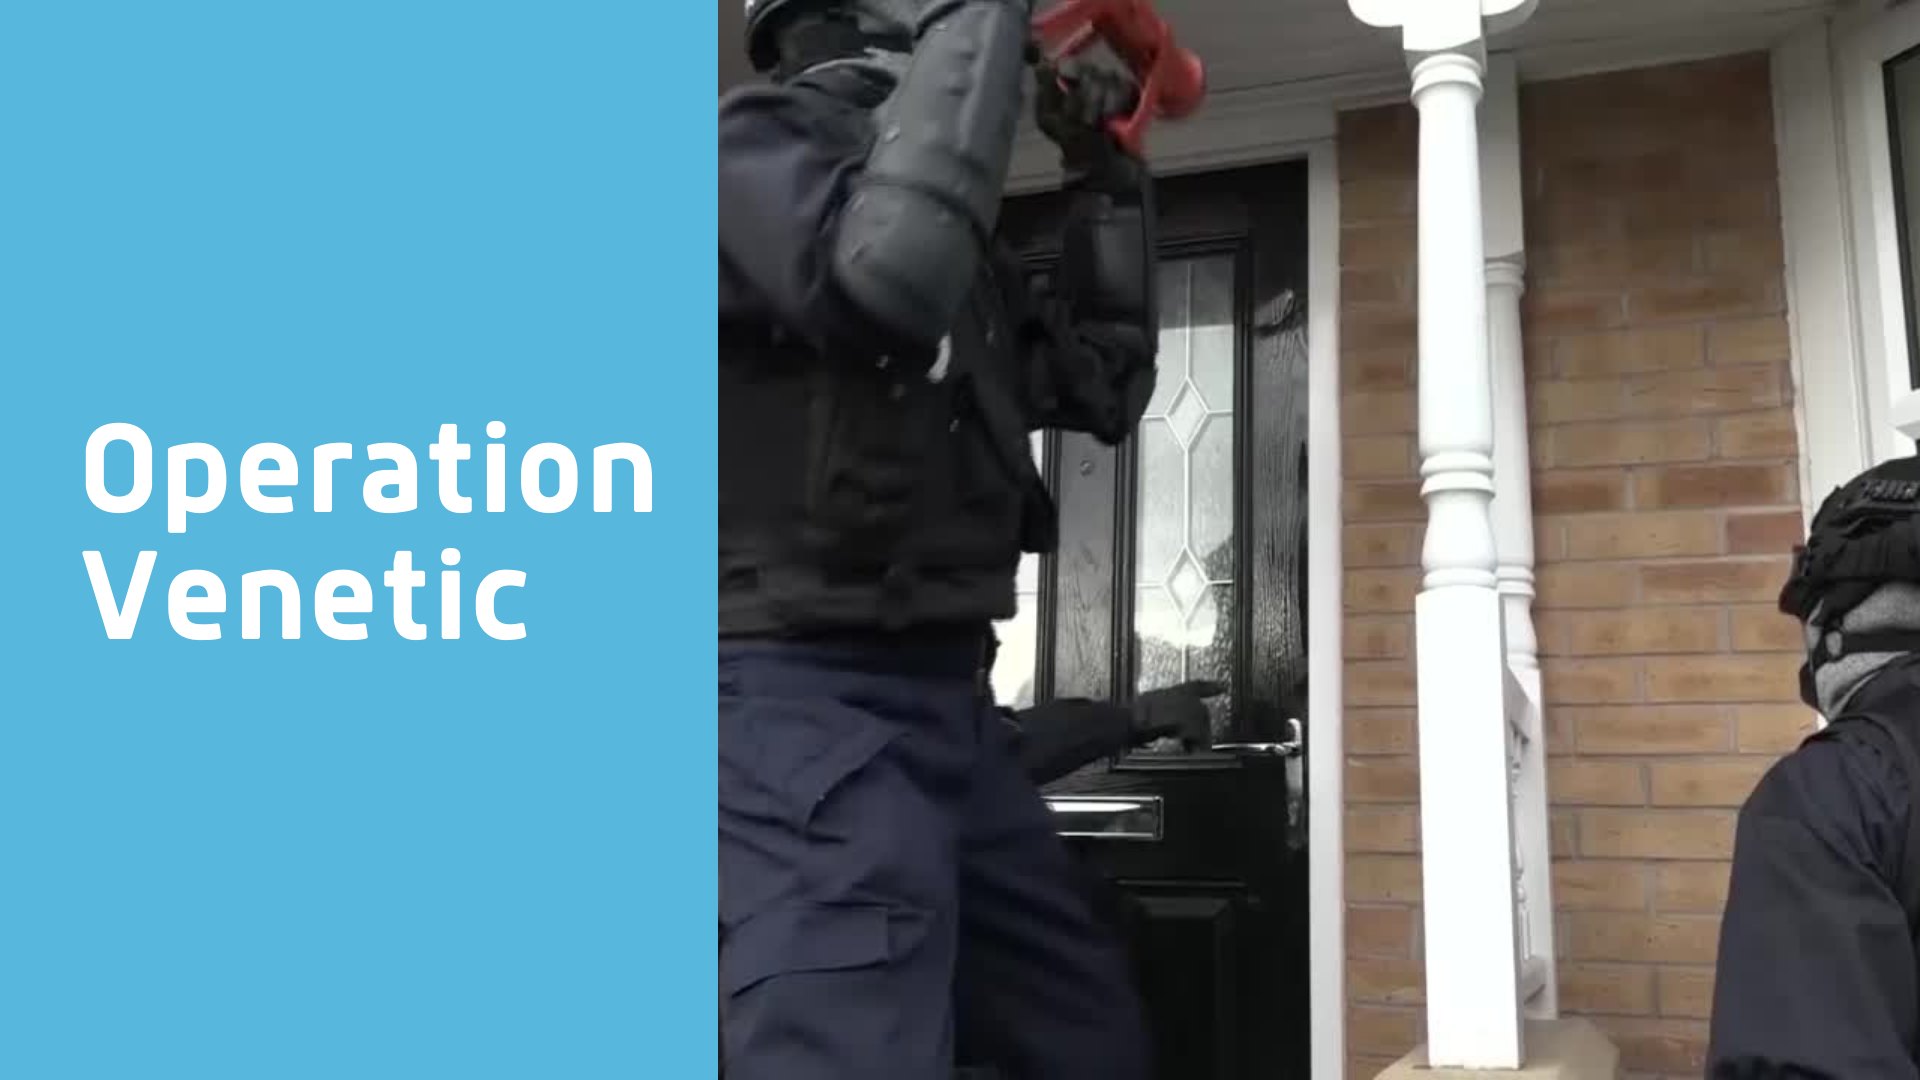 Operation Venetic - NCA officers breaking door down